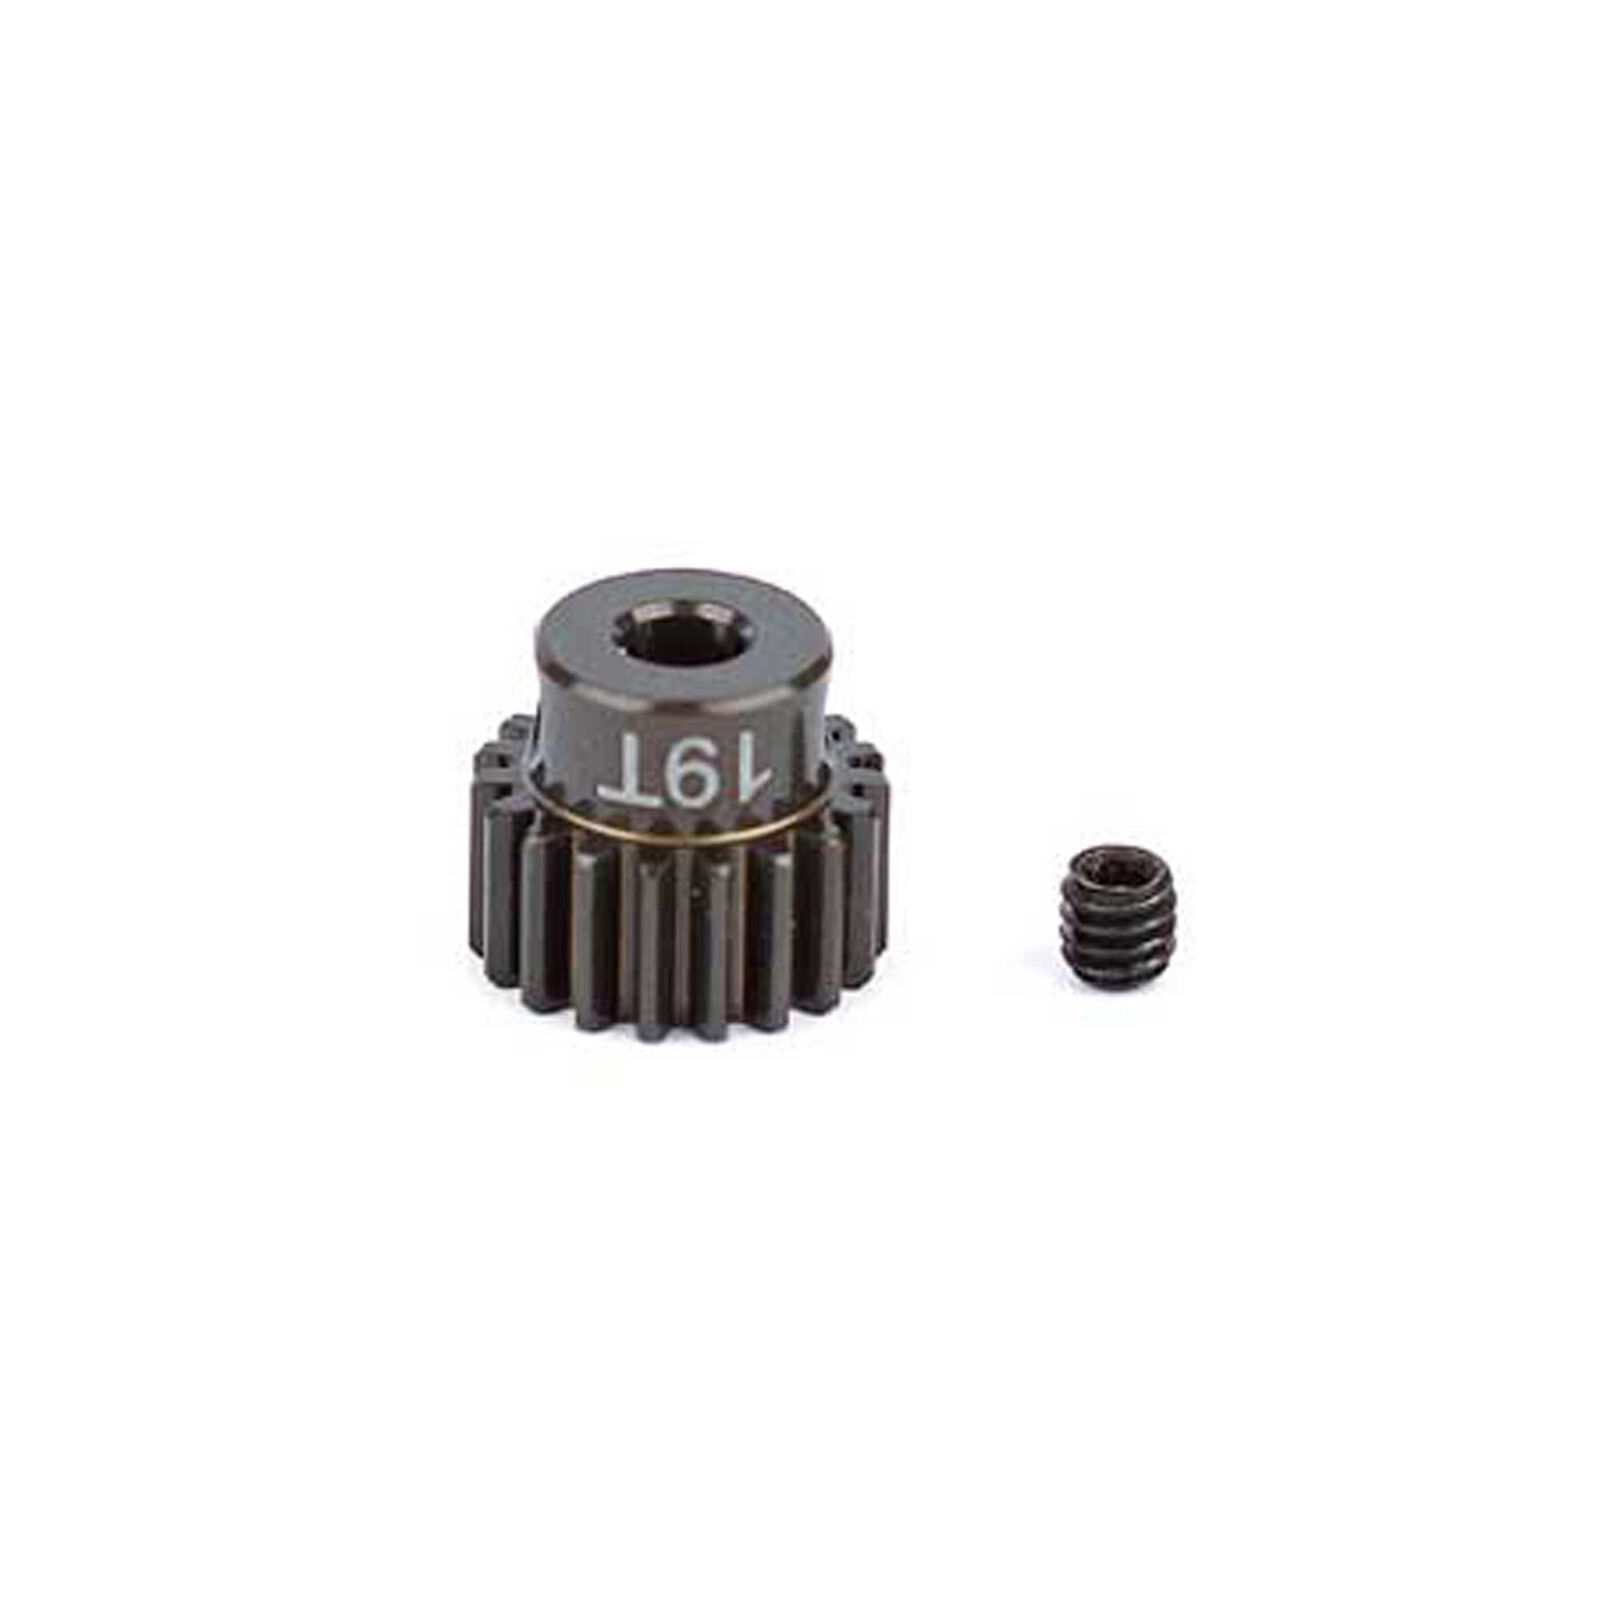 Factory Team Aluminum Pinion Gear, 19T, 48P, 1/8 shaft